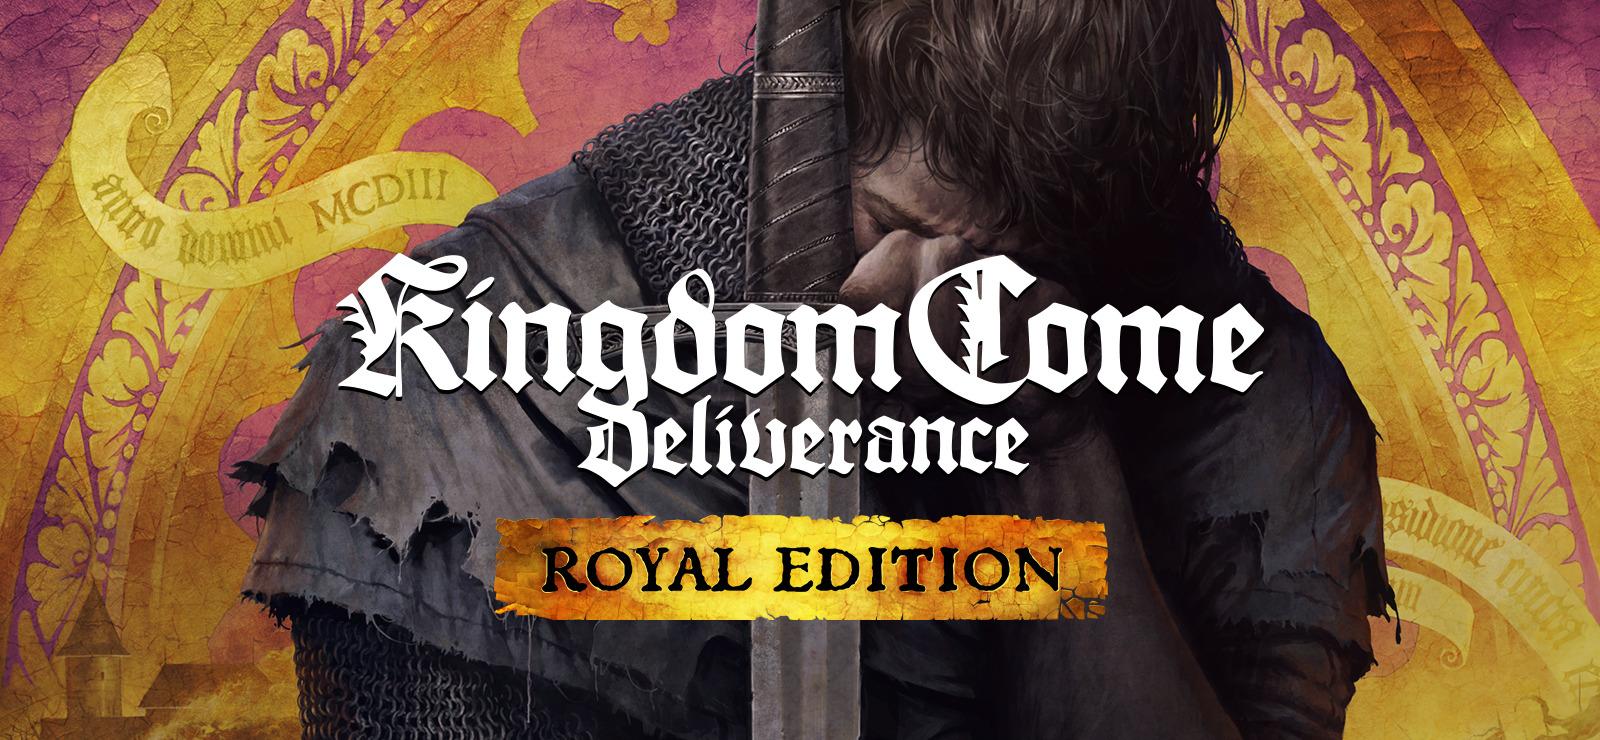 Kingdom Come: Deliverance Royal Edition. [PC] [ES Sub] [GOG] - [VPN Rusa]